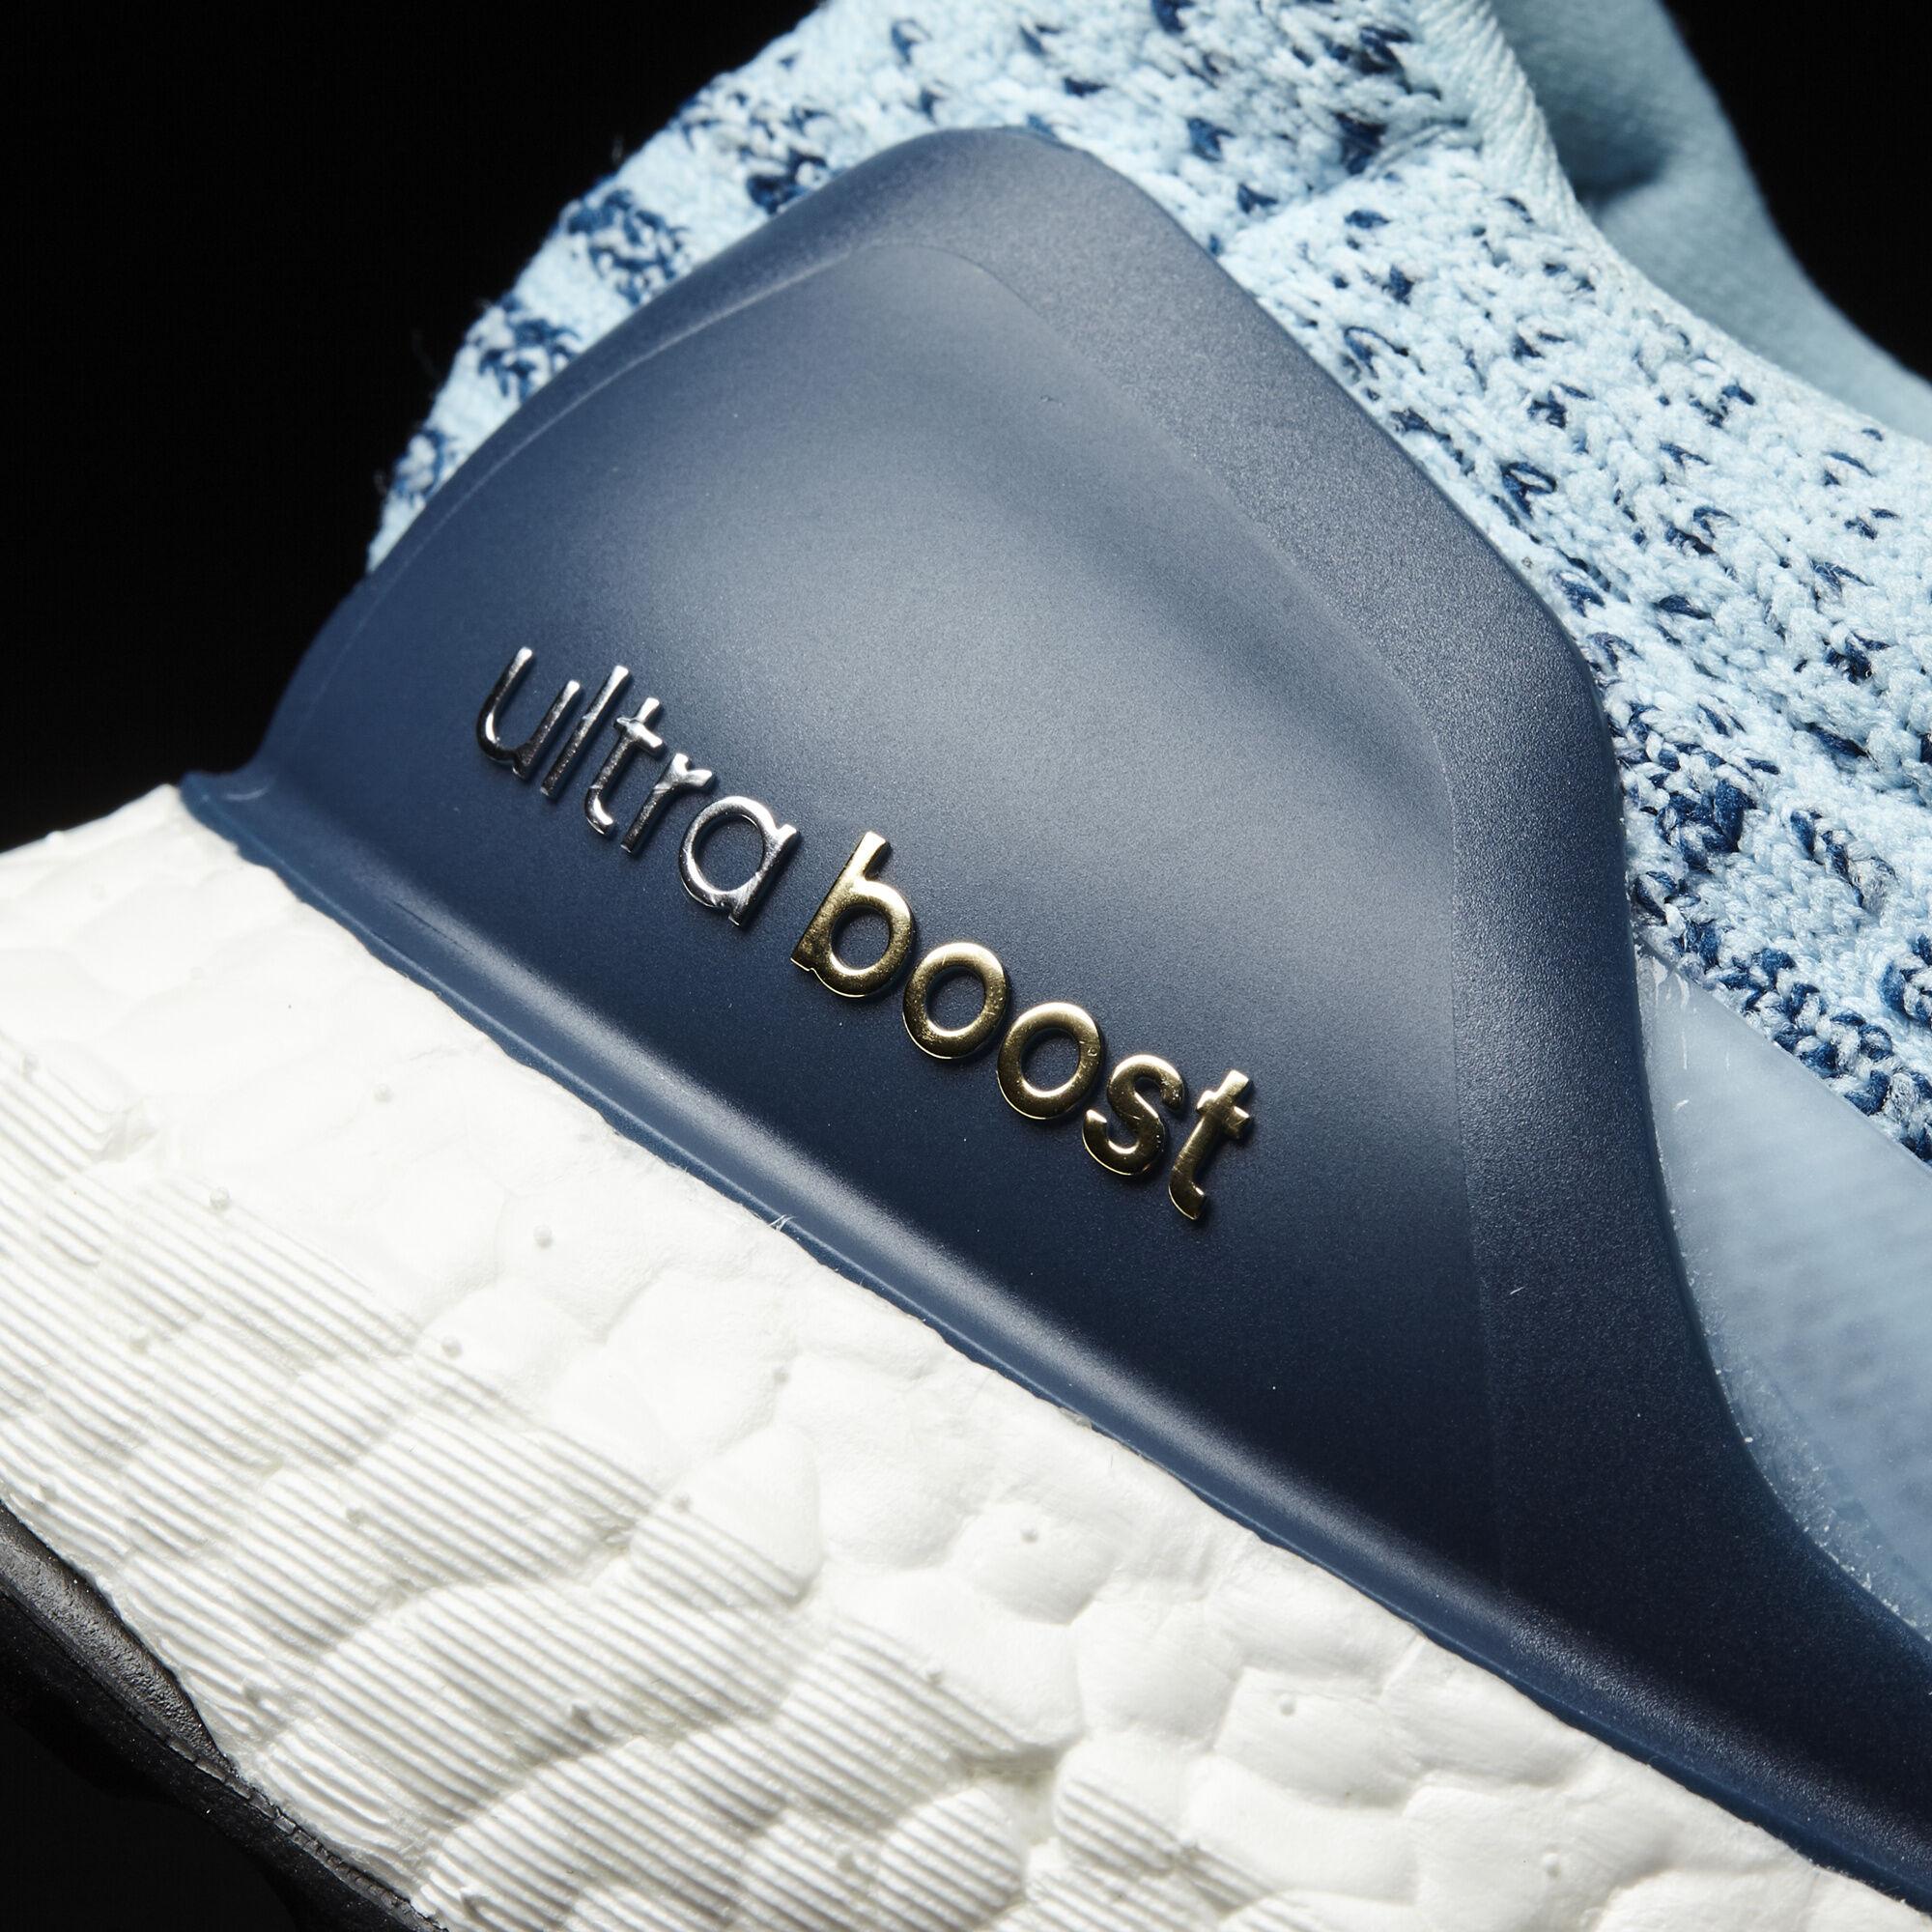 963c29256 adidas UltraBOOST Shoes - Blue